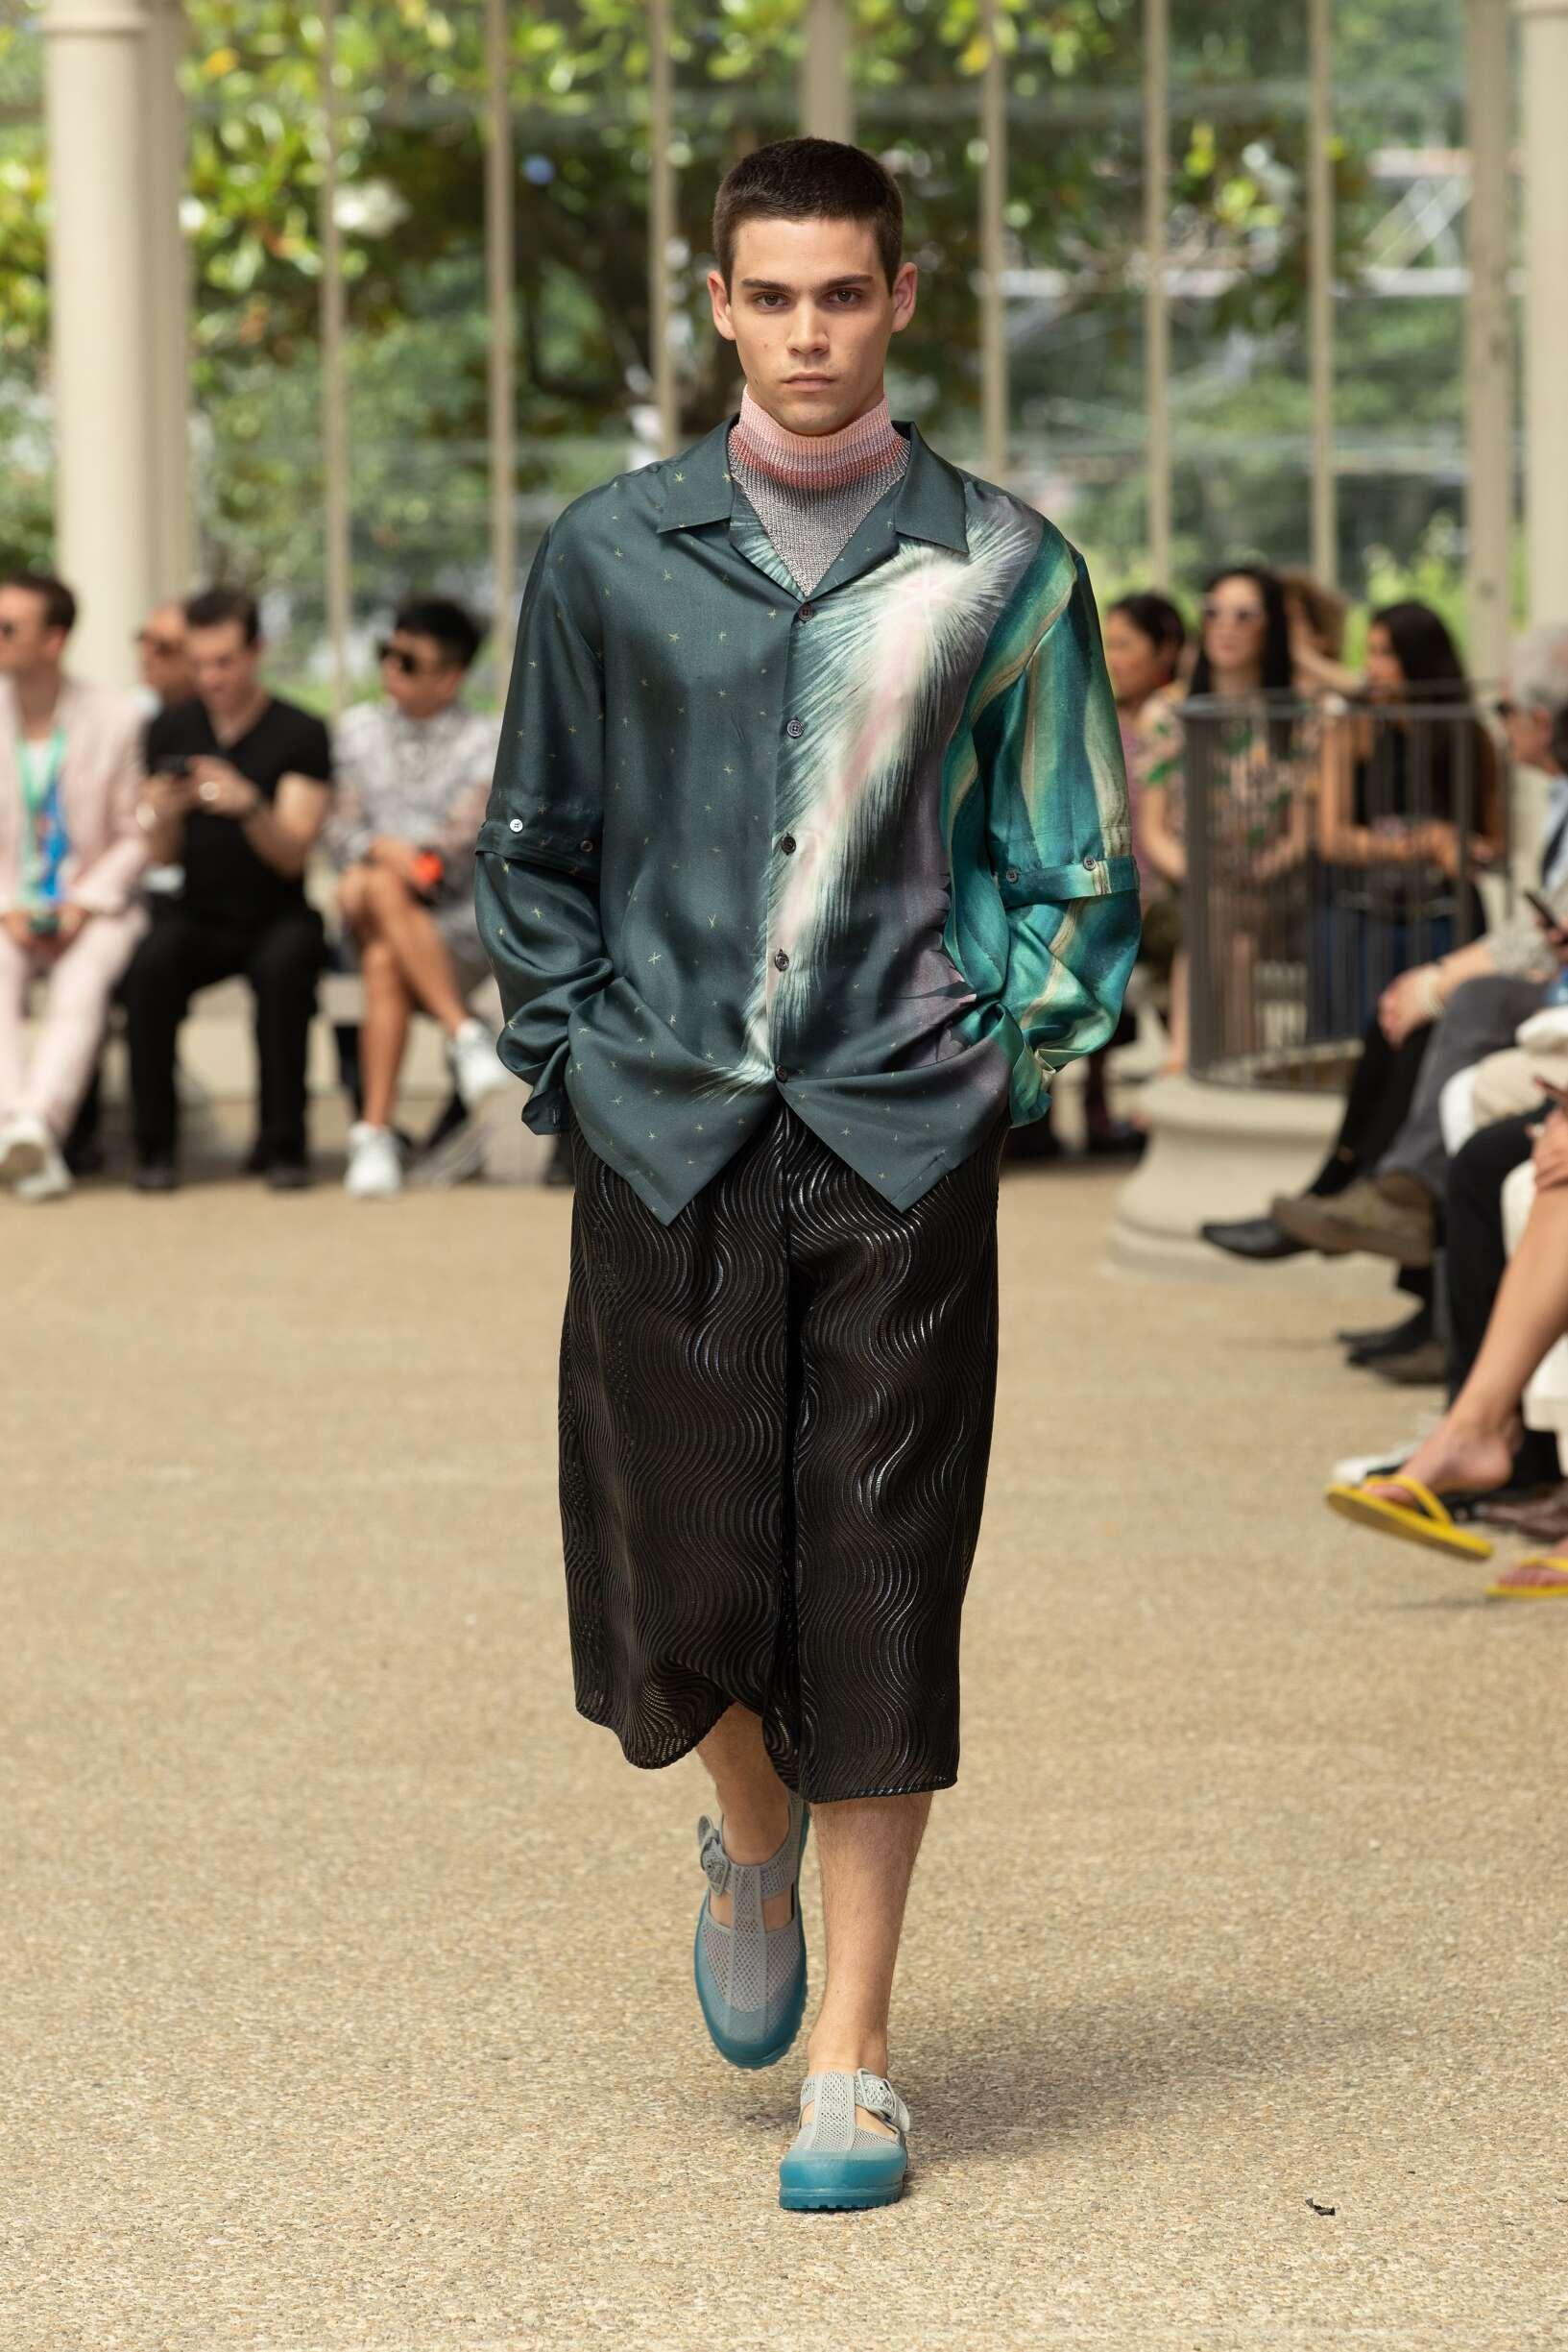 2020 Marco De vincenzo Summer Catwalk